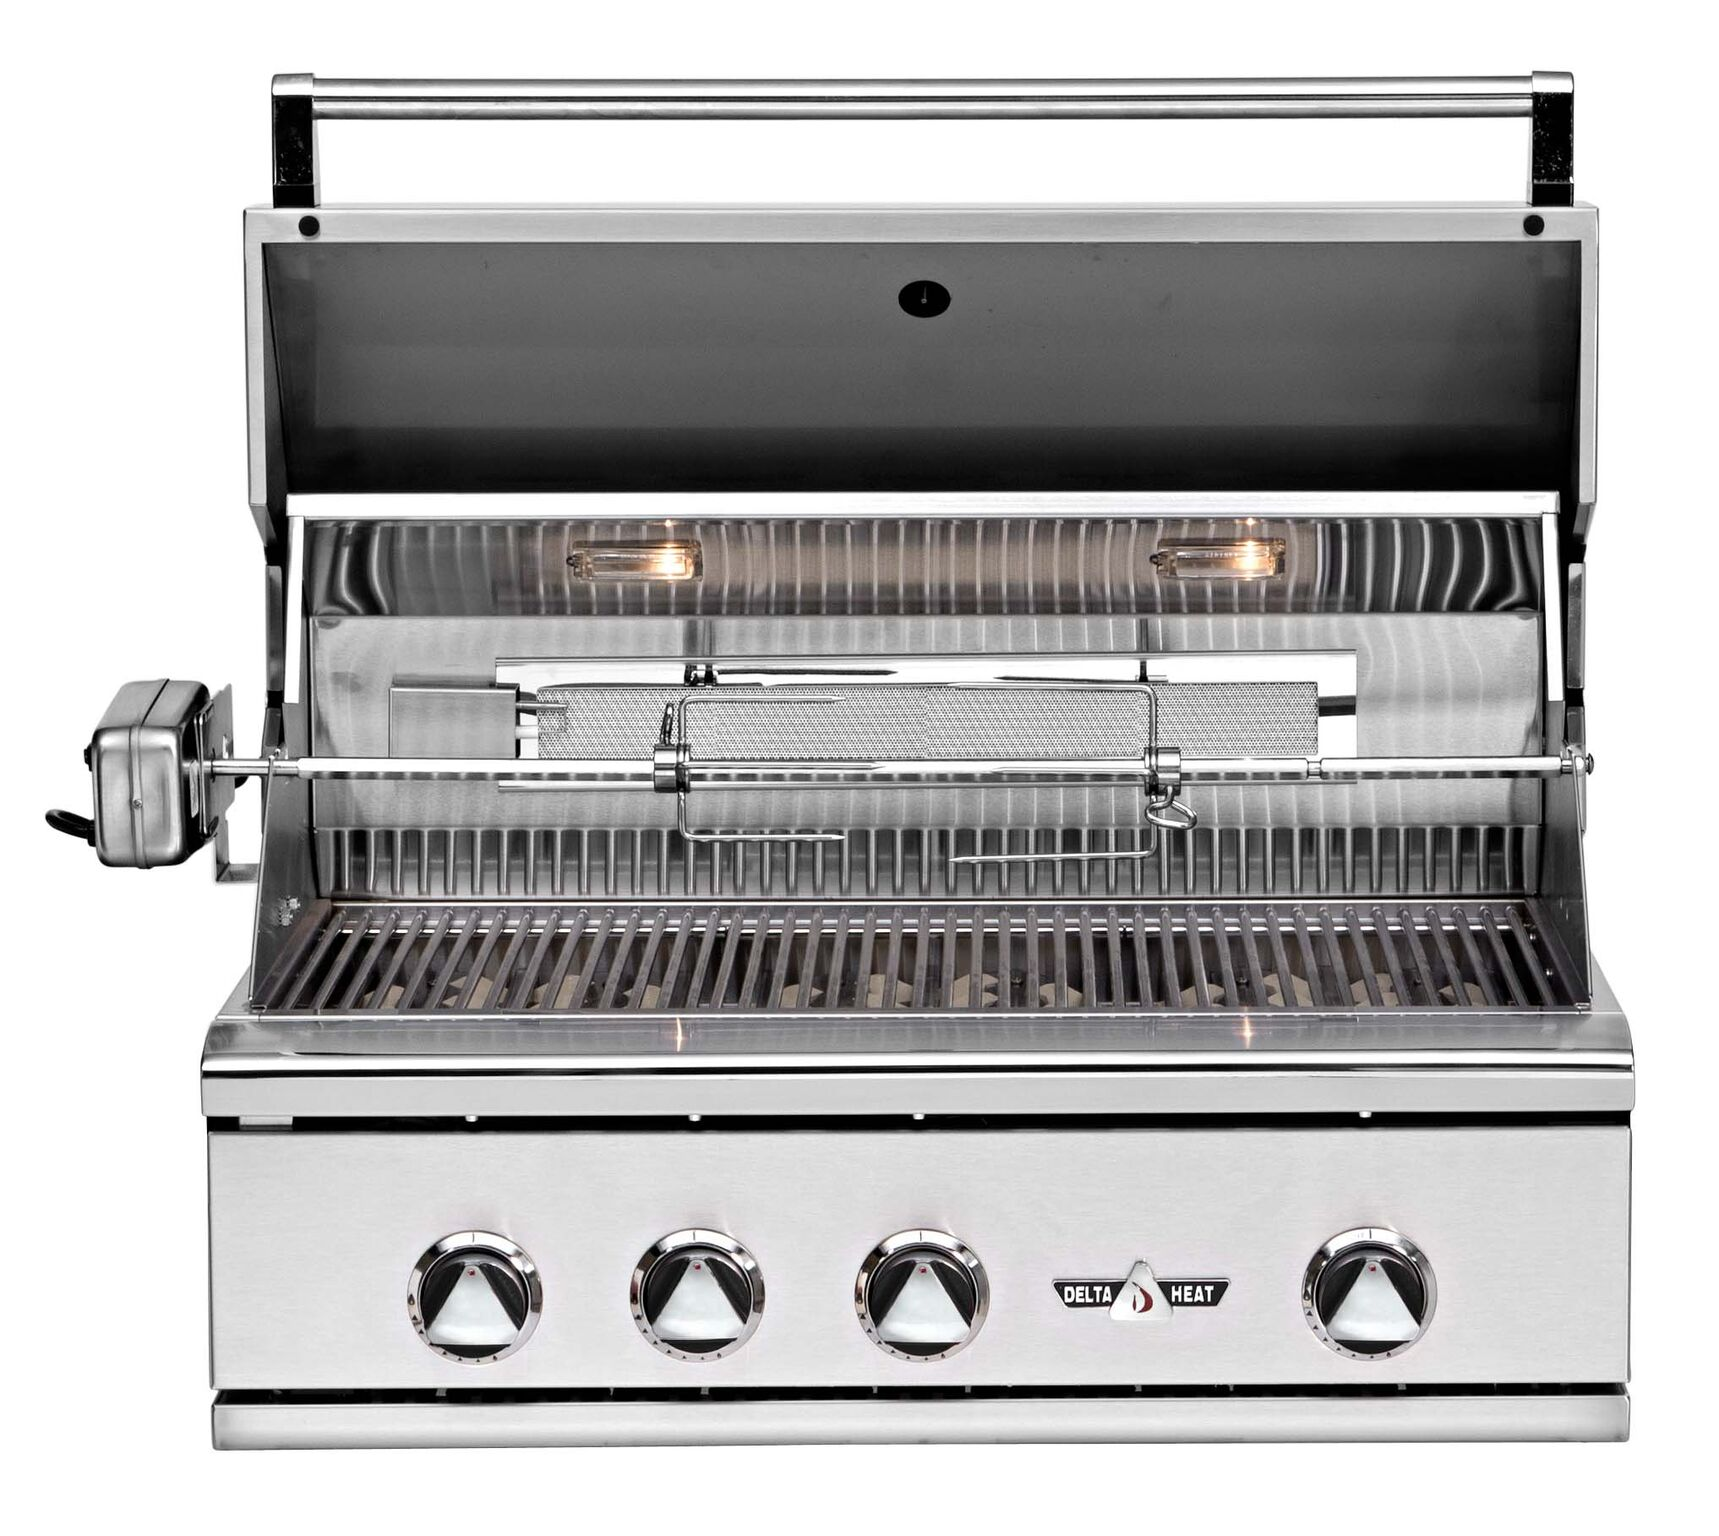 Delta Heat DHBQ32 Built-in Grill